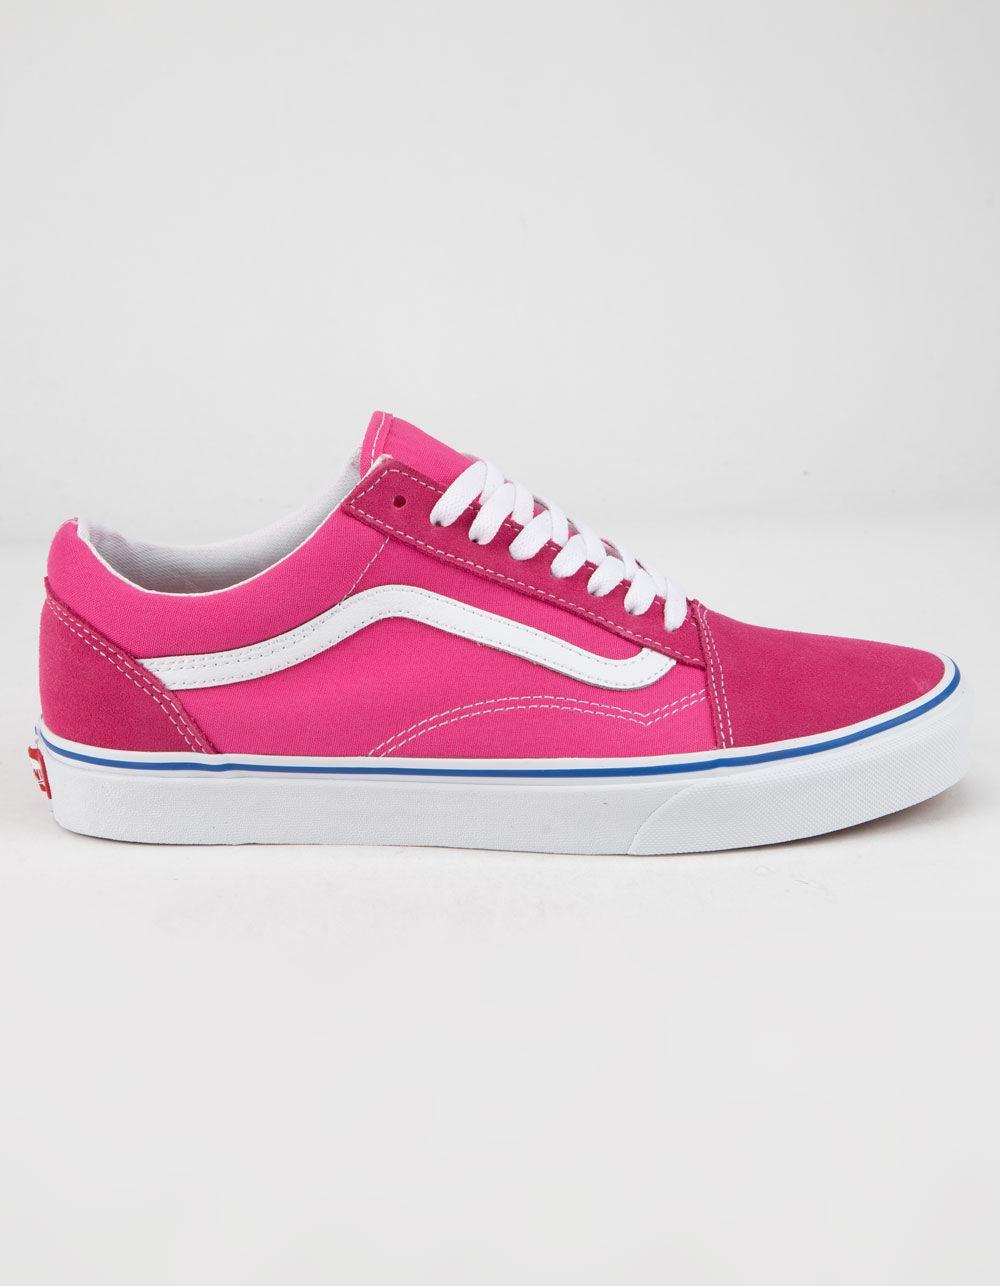 c2efabedad Lyst - Vans Suede Canvas Old Skool Carmine Rose Shoes in Pink